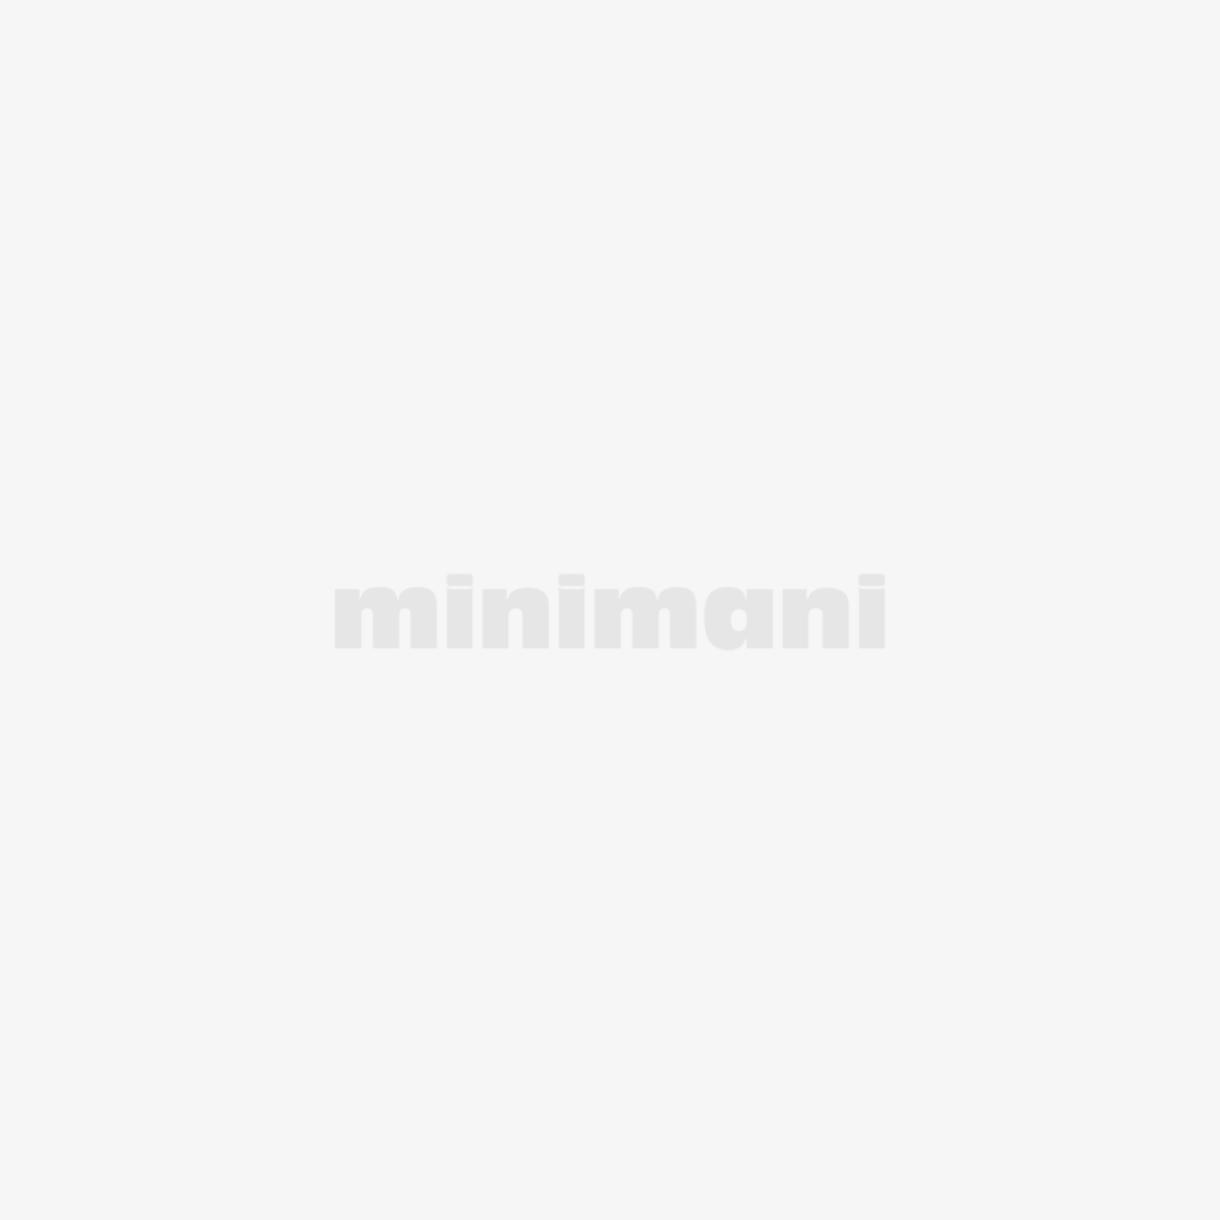 PHILIPS HR1855/80 MEHULINKO, 700W, KANNU 0,8L, HELPPO PUHDISTAA